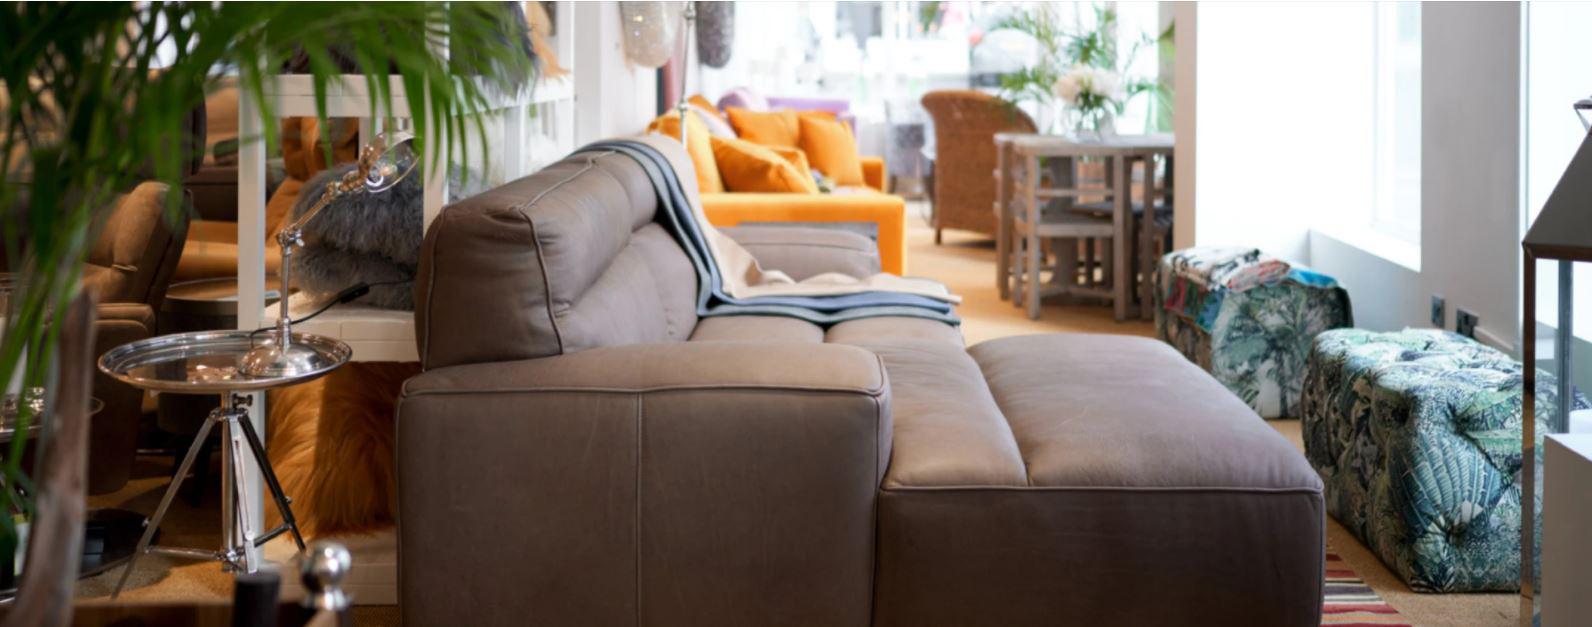 Sofa Workshop, Royal Tunbridge Wells